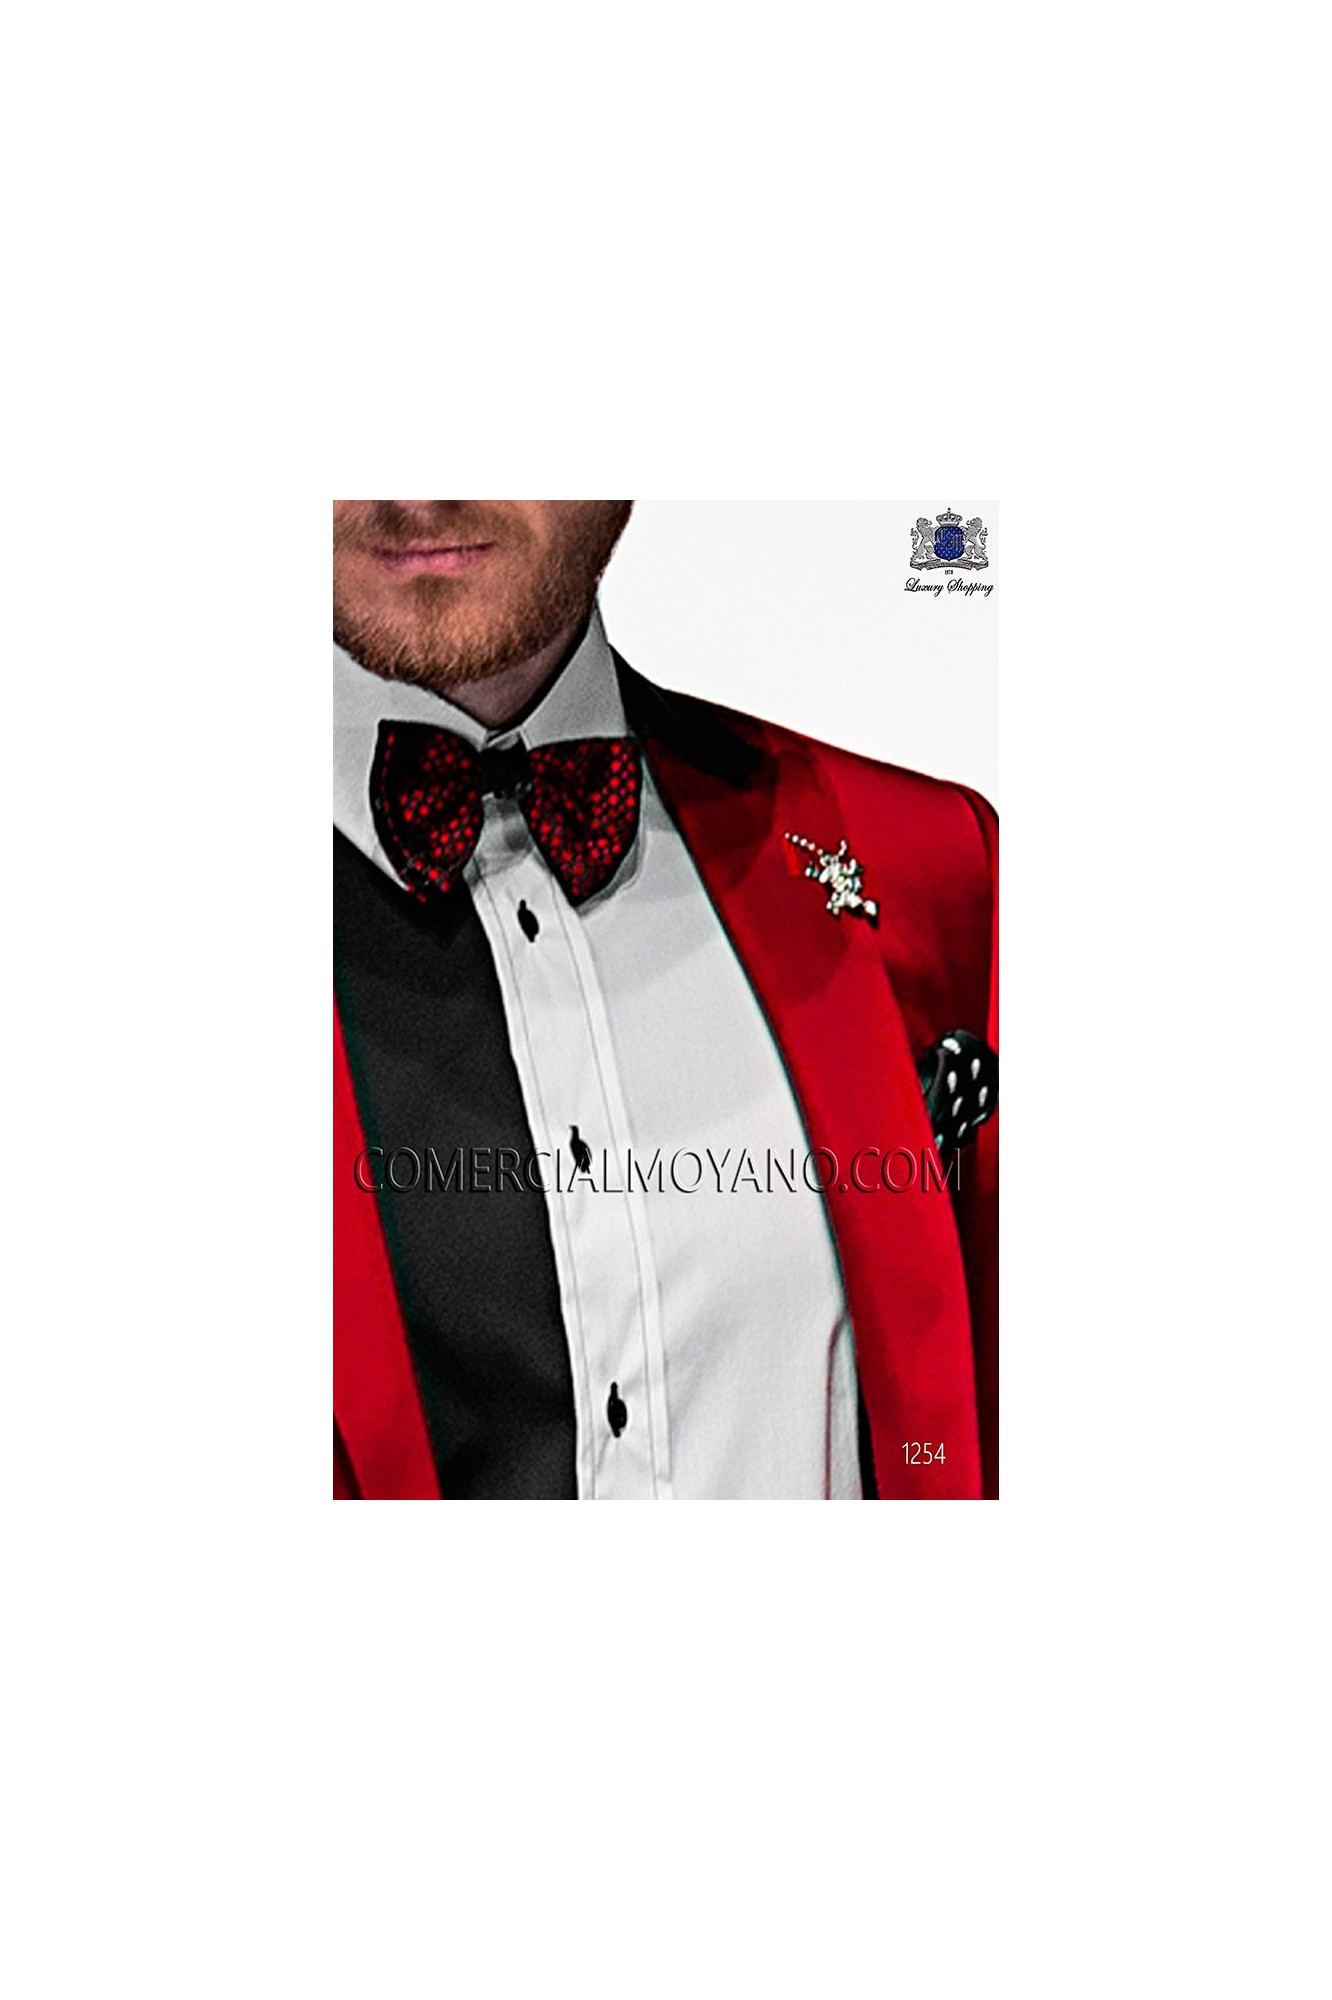 Italian emotion red men wedding suit, model: 1254 Ottavio Nuccio Gala 2017 Emotion Collection